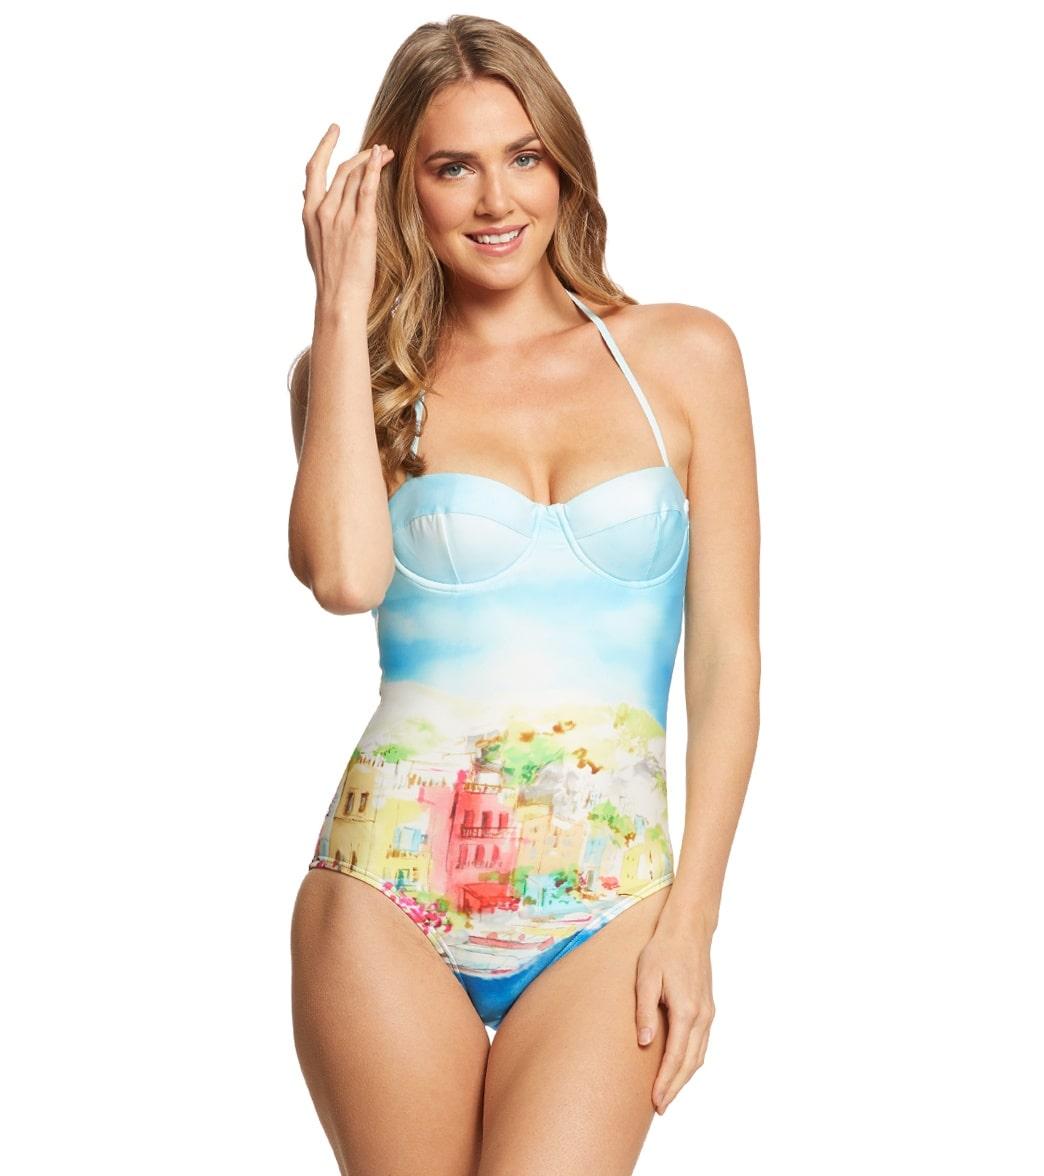 Kate Spade New York Ocean Grove Underwire Halter One Piece Swimsuit